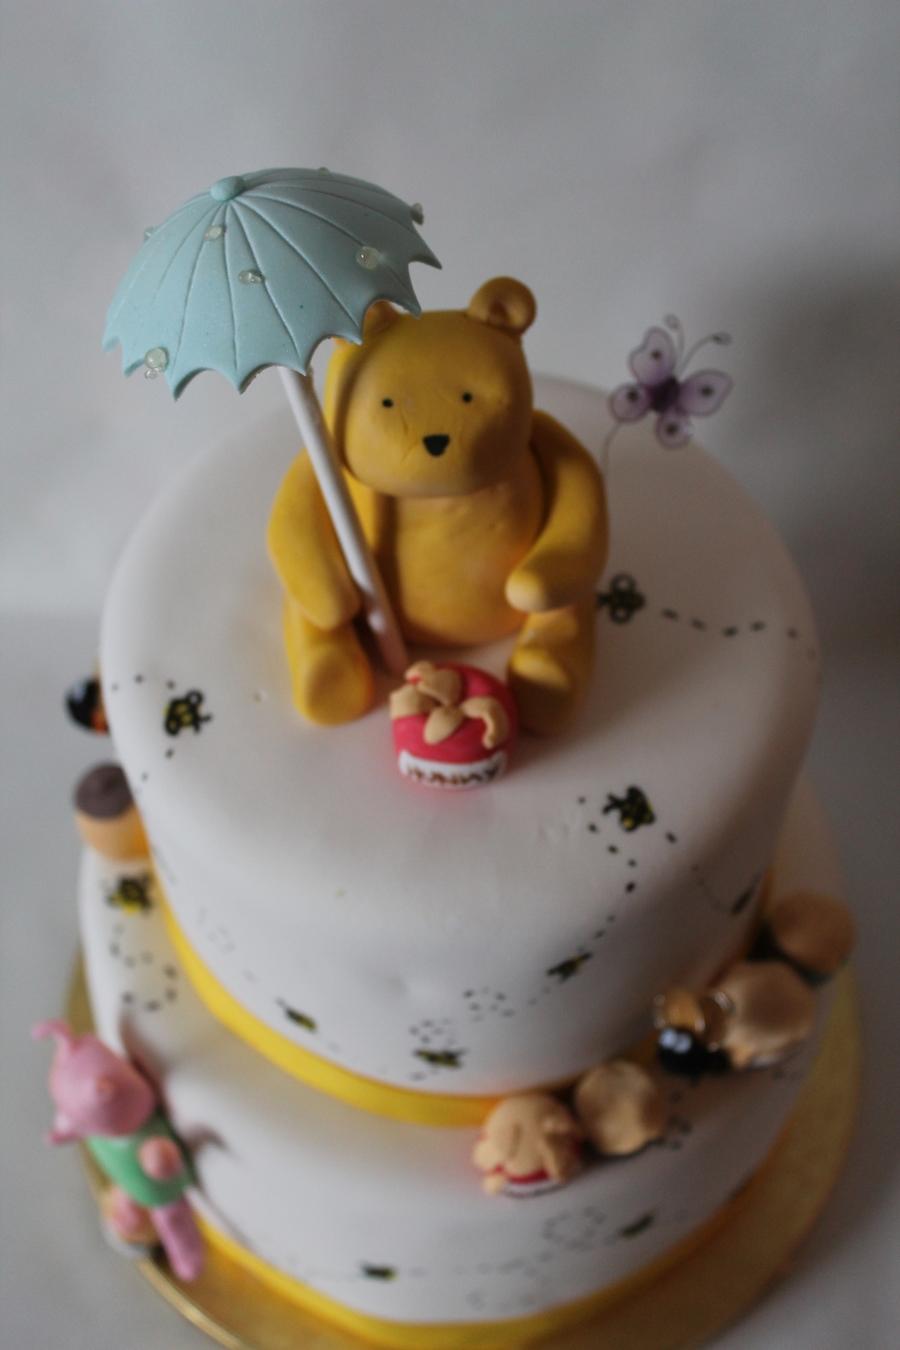 How To Make A Winnie The Pooh Cake